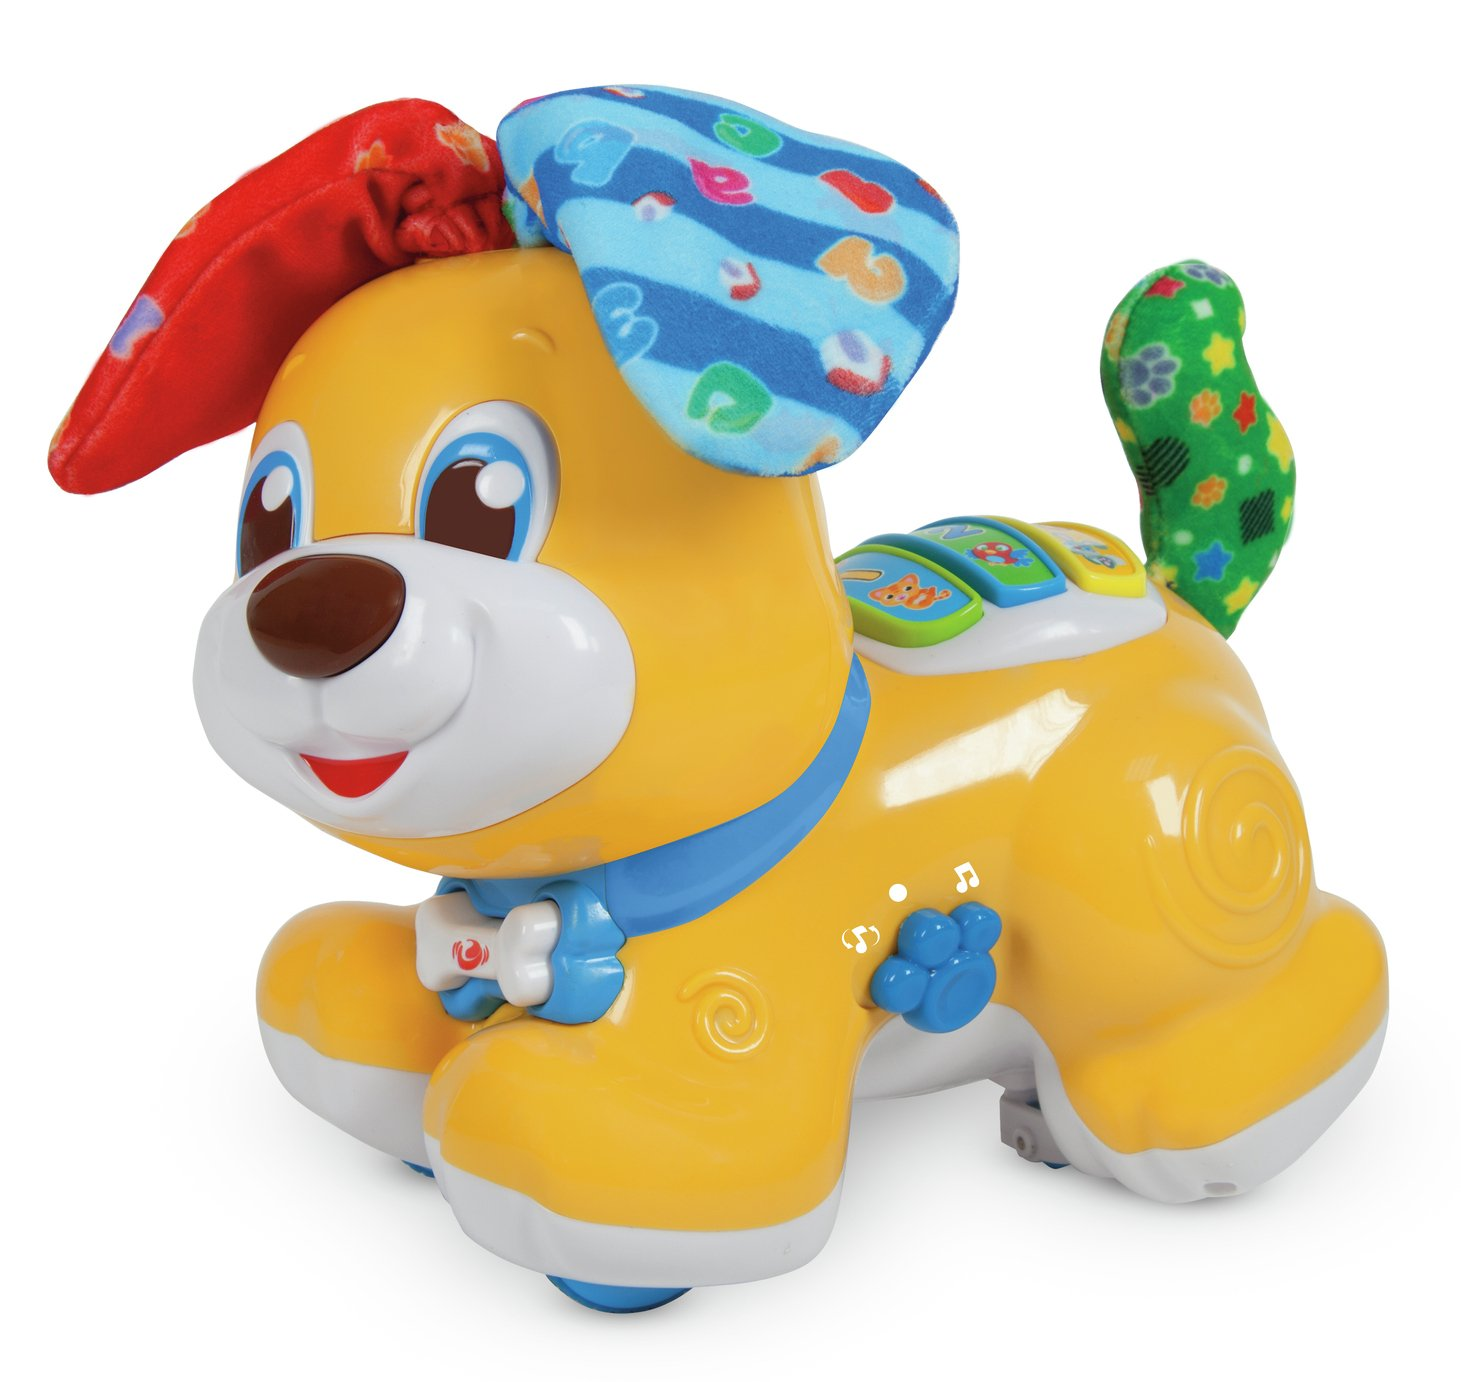 Baby Clementoni Peek-a-boo Dog